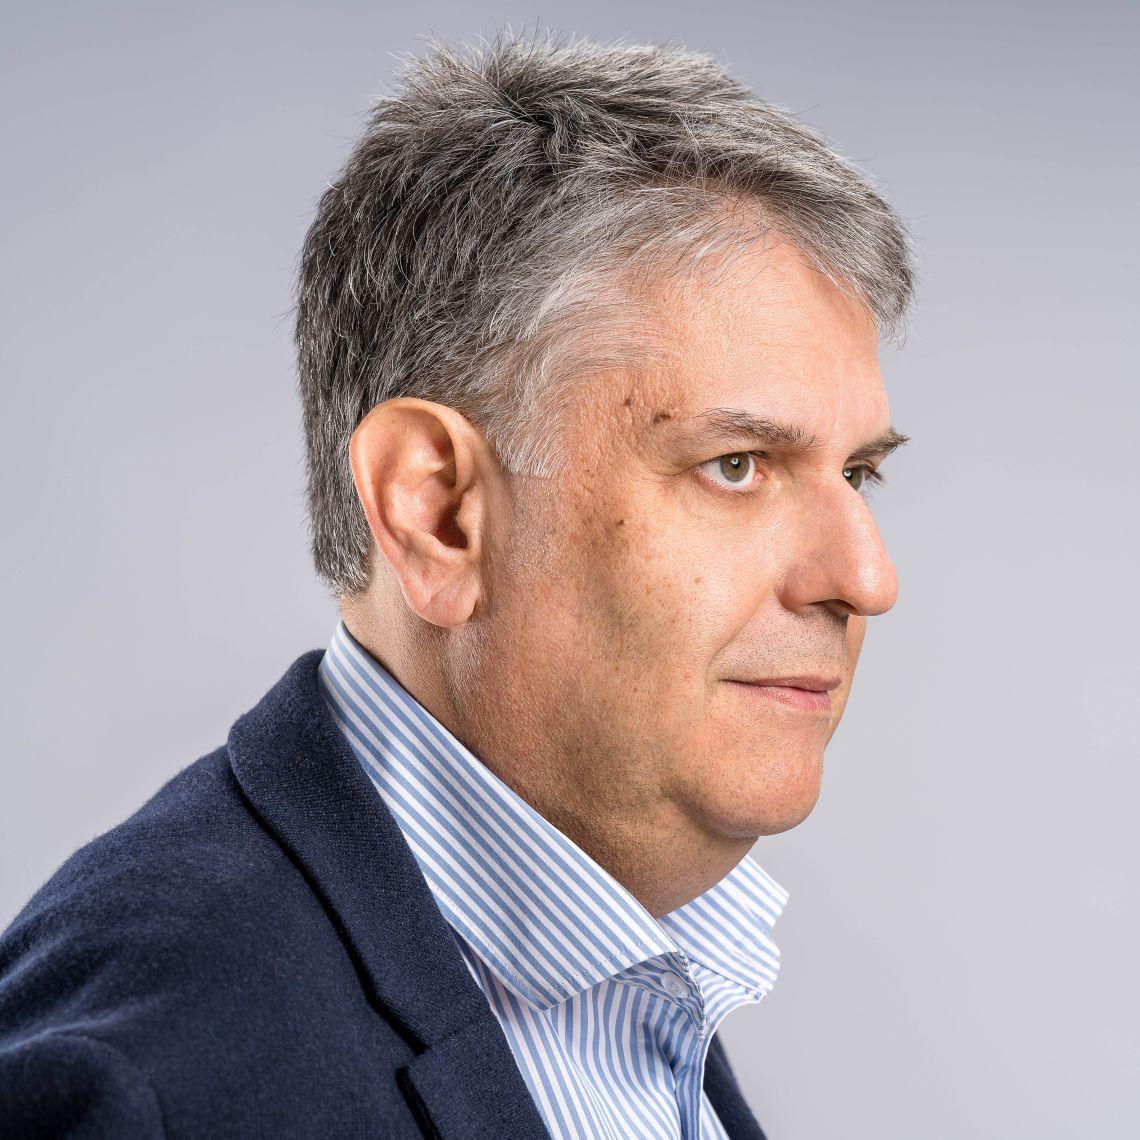 Stefan N. Constantinescu